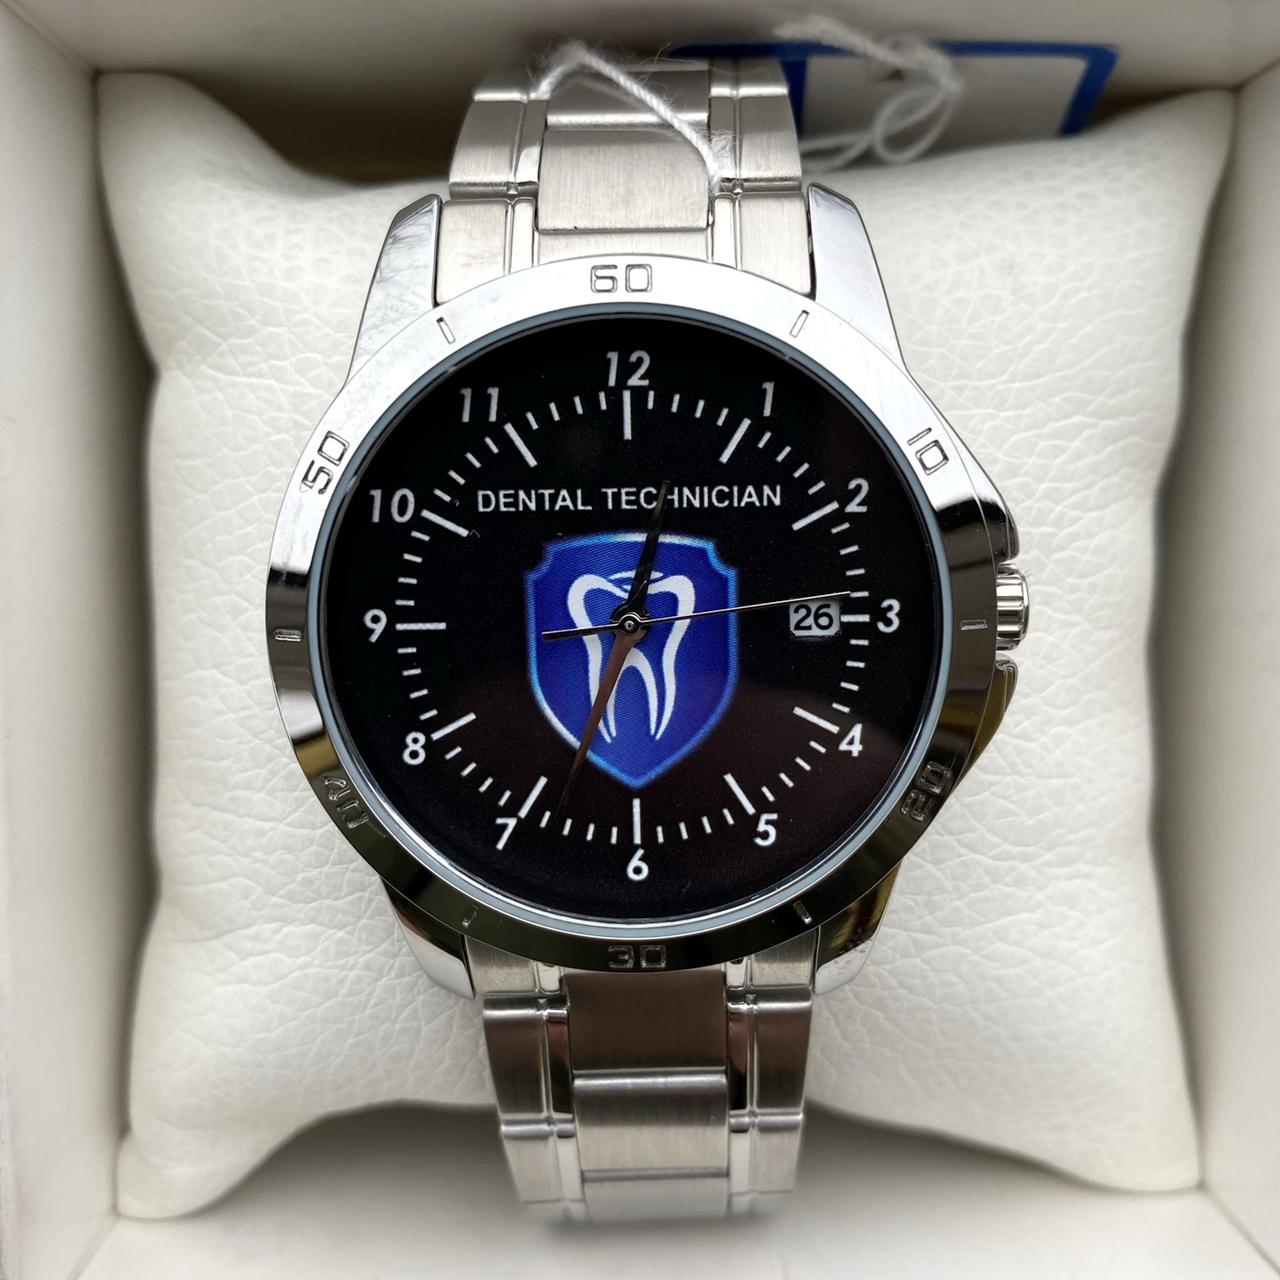 Годинник наручний Casio з логотипом Dental Technician